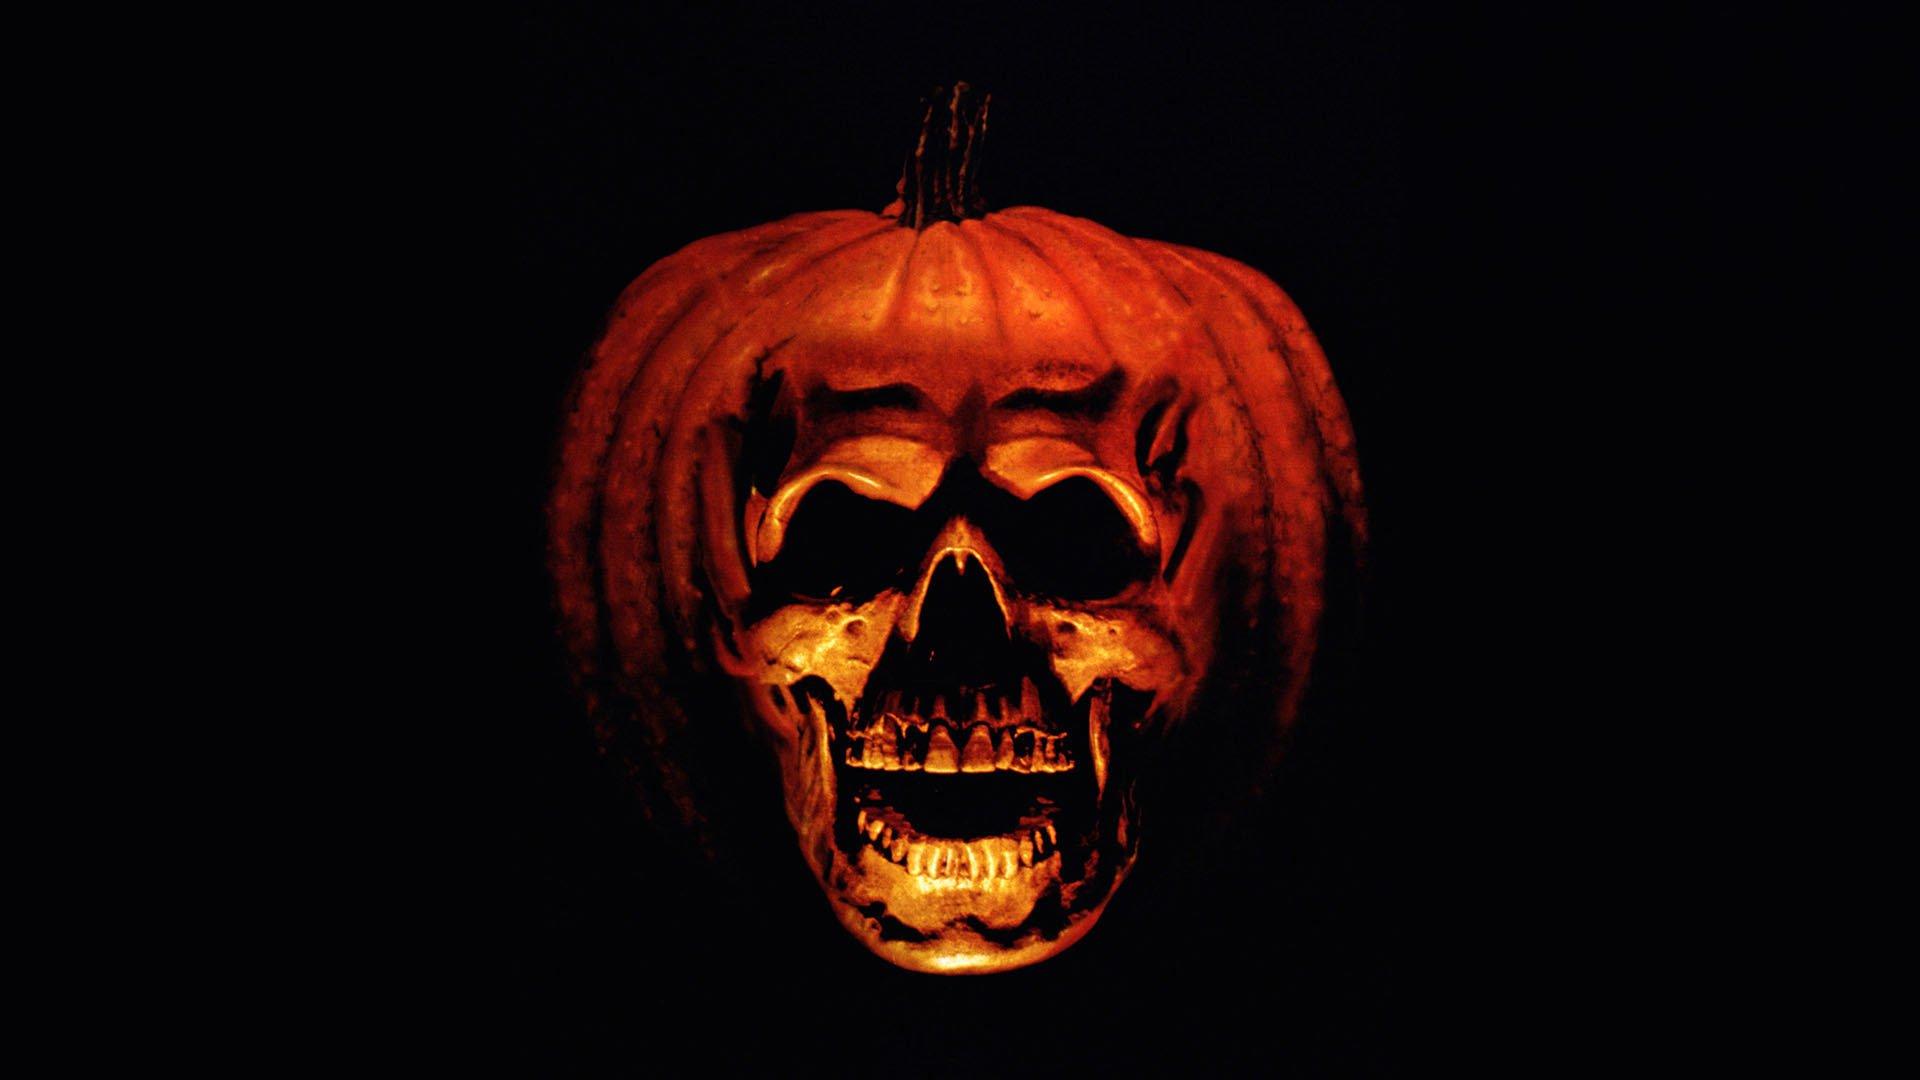 Halloween II 1981 HD Wallpaper Background Image 1920x1080 1920x1080